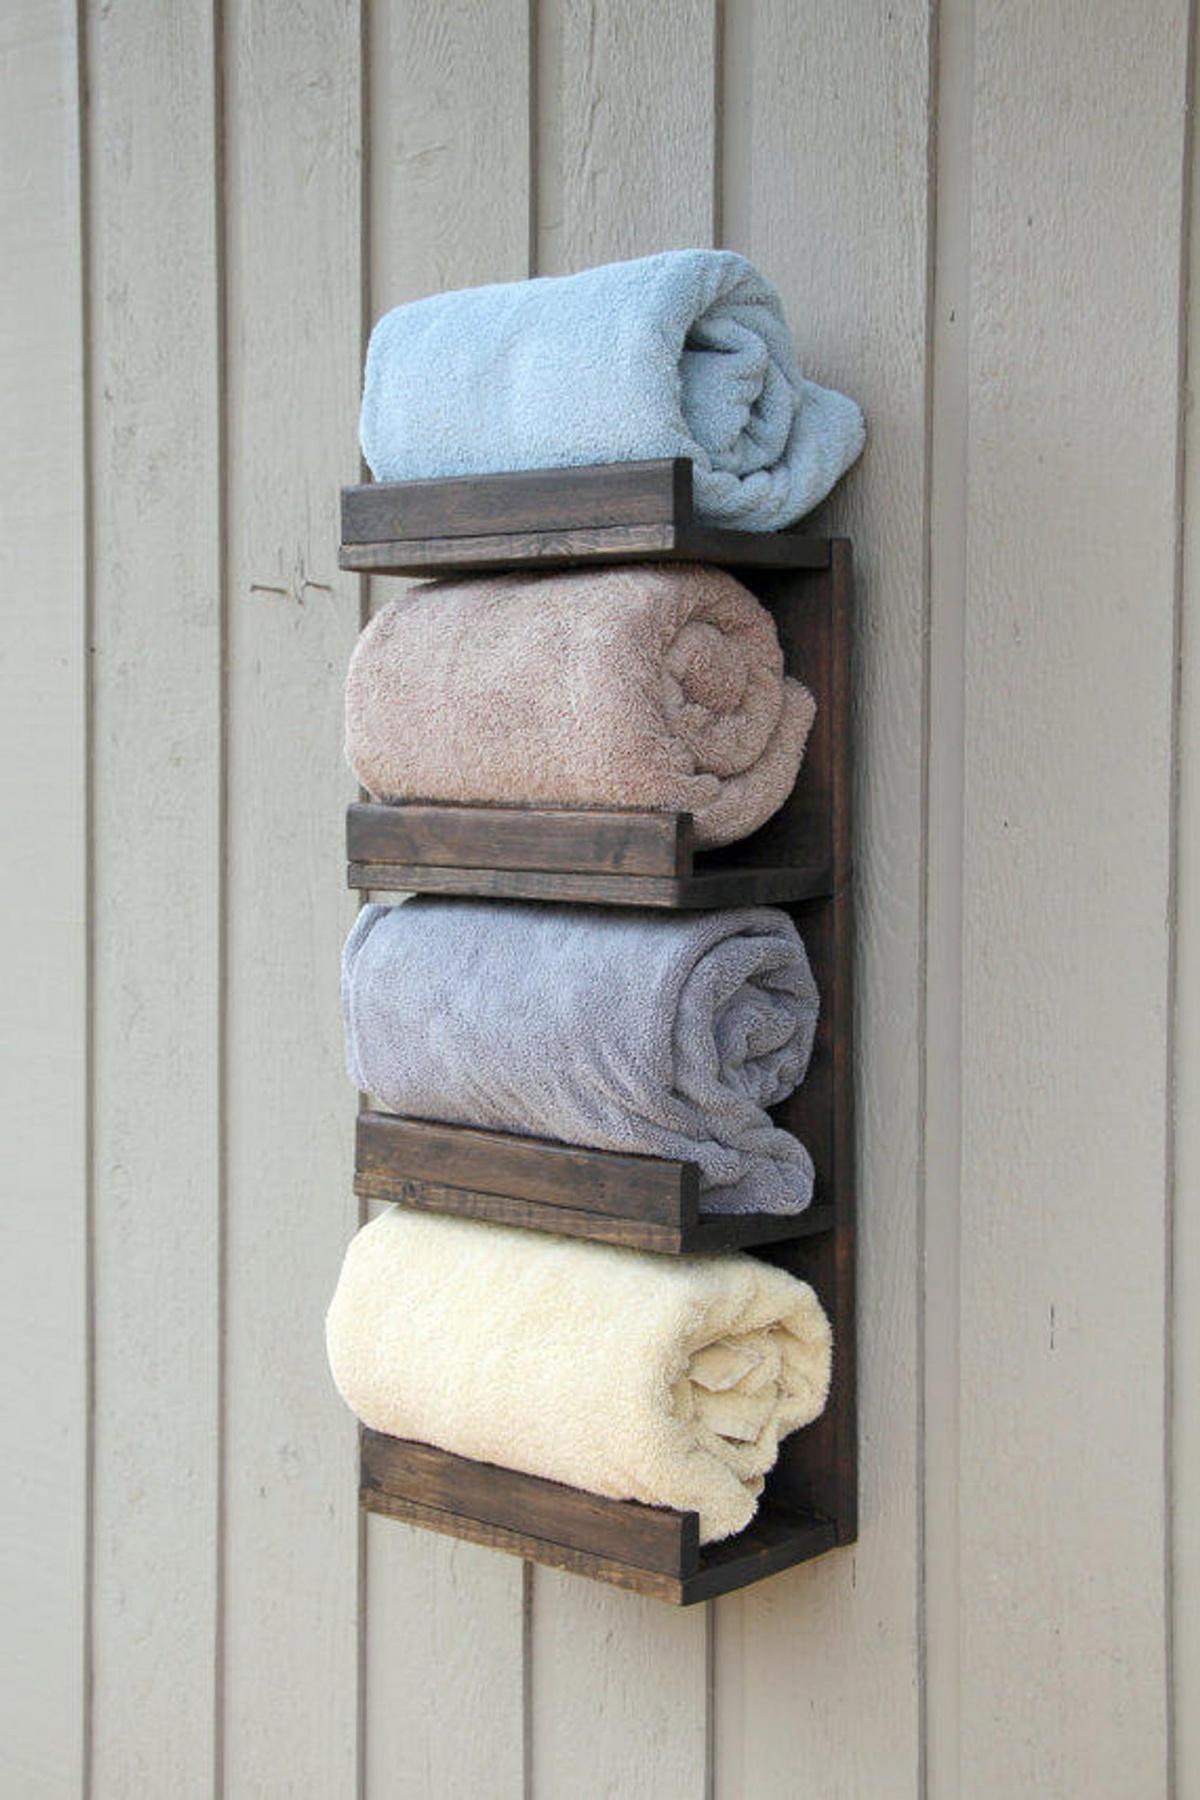 A rustic towel organizer